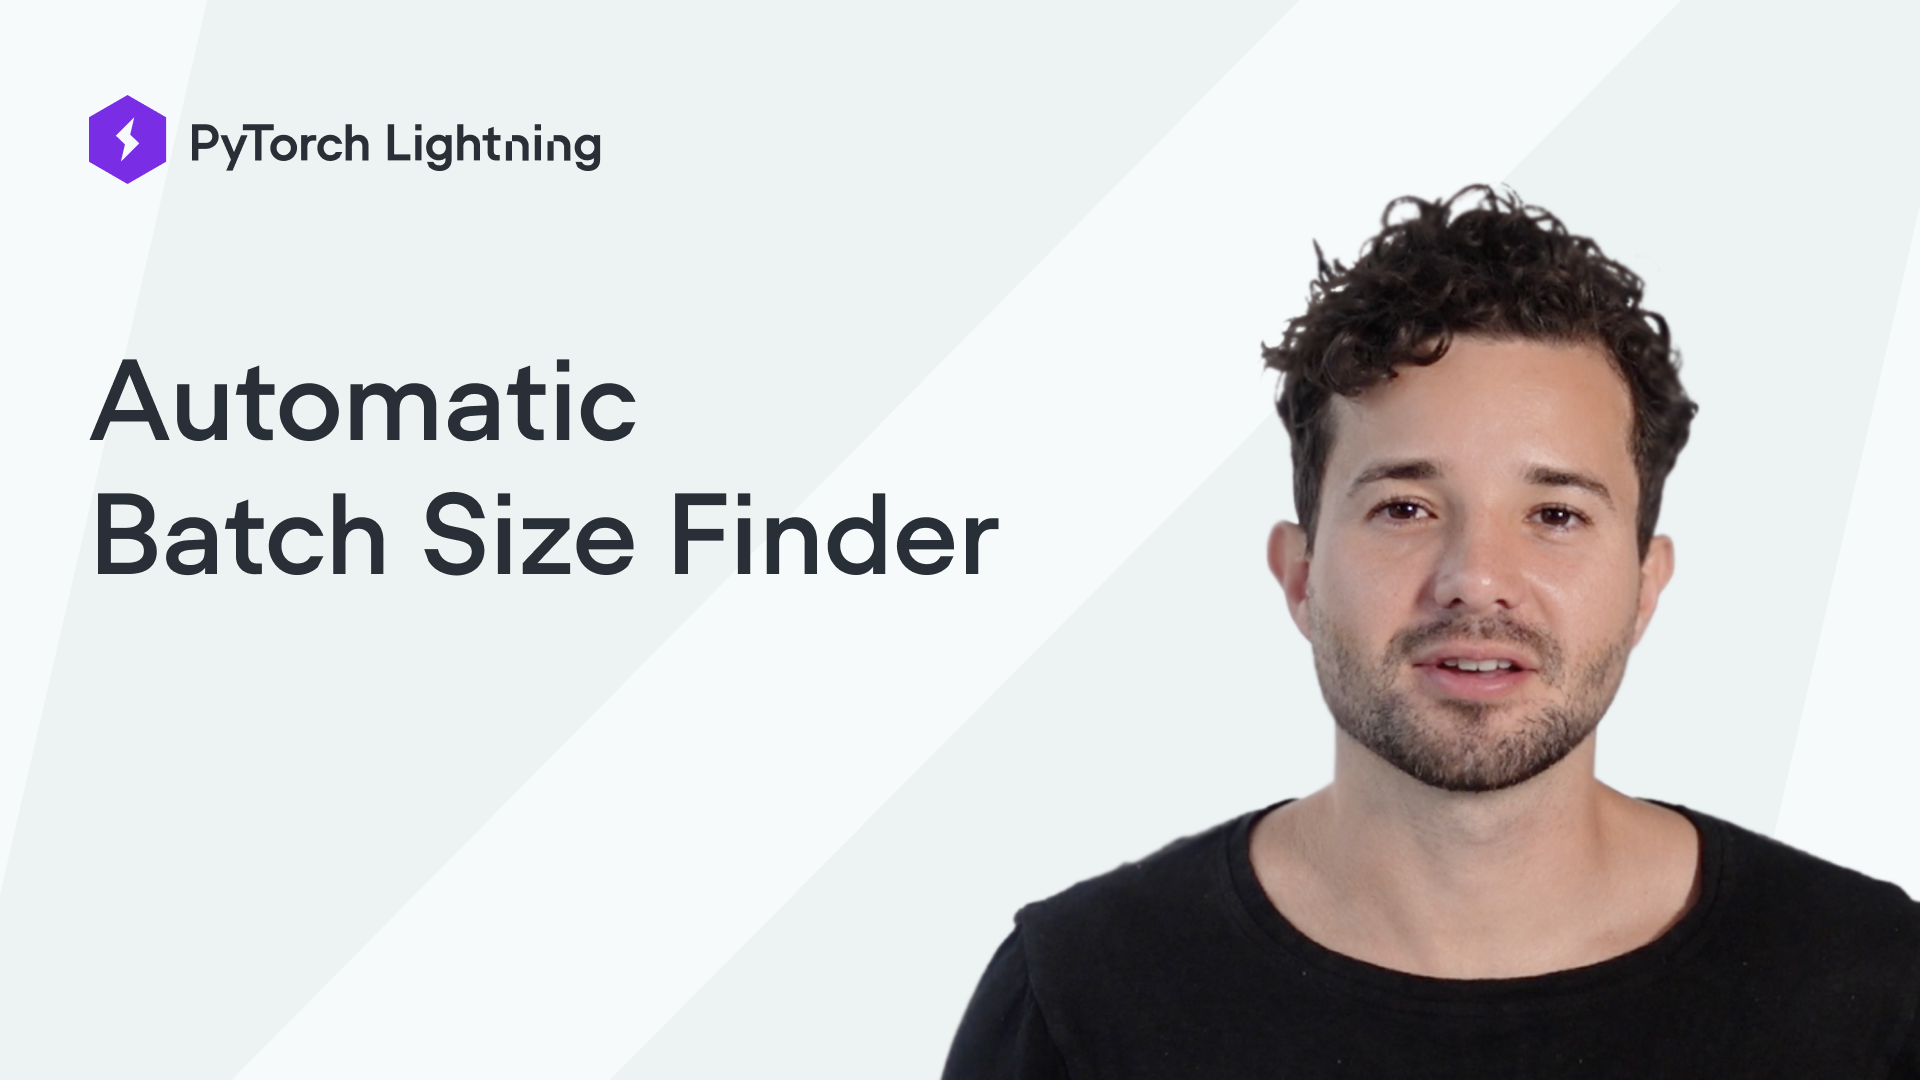 Automatic Batch Size Finder